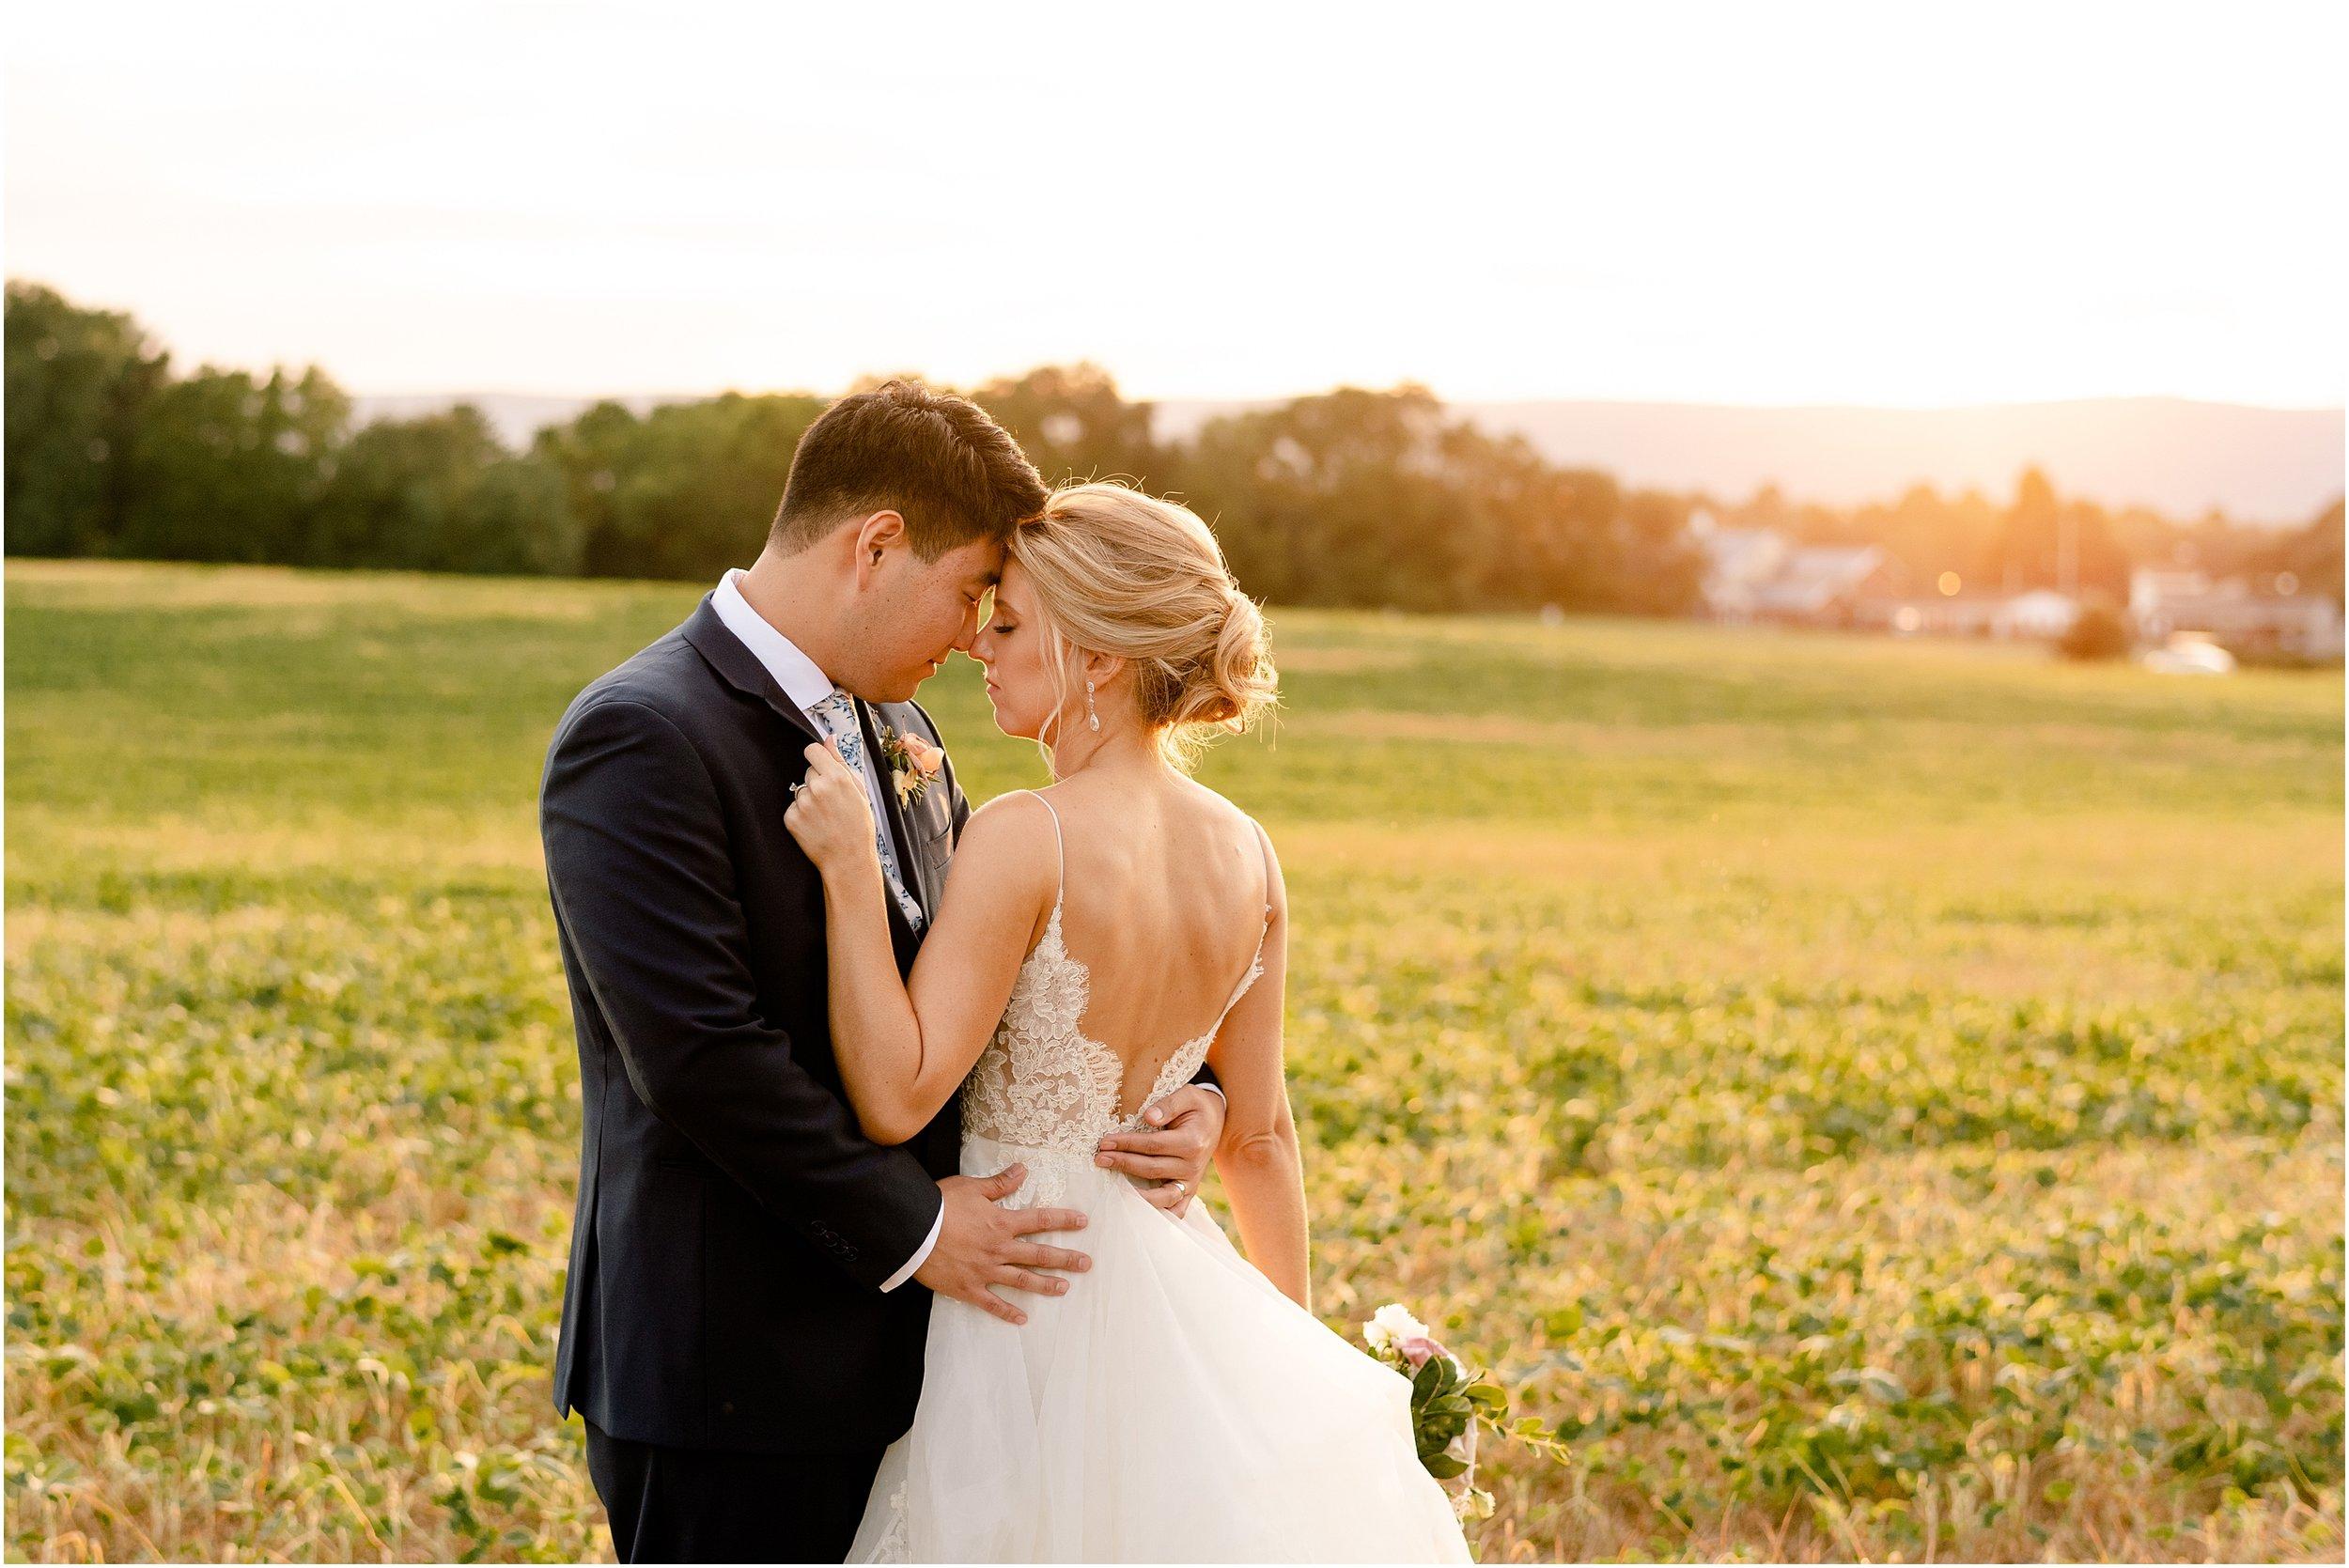 hannah leigh photography Walkers Overlook Wedding Walkersville MD_3551.jpg